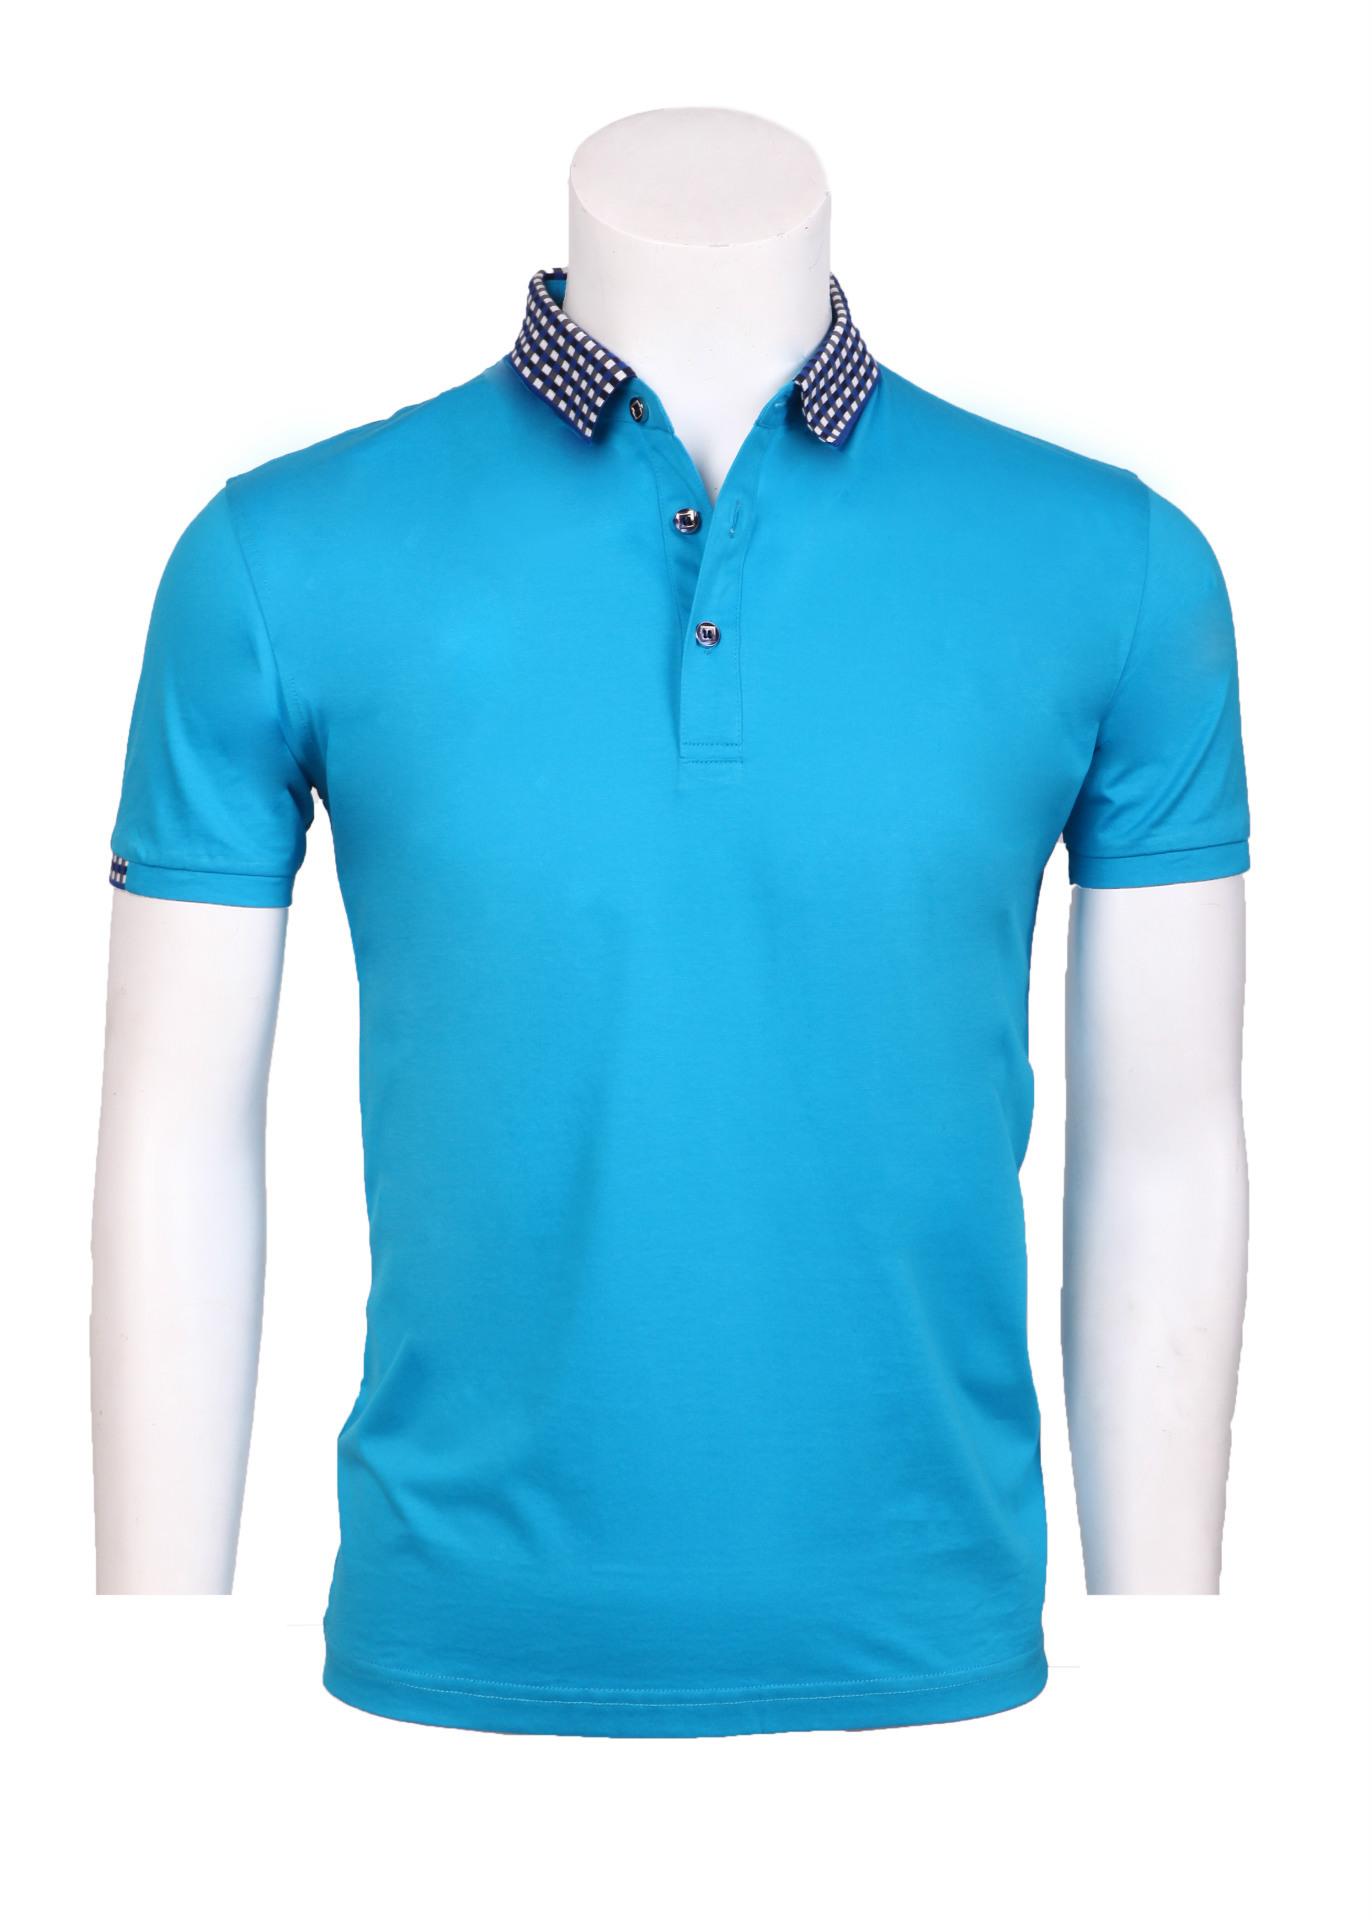 T恤衫搭配选择什么款式好看?日常洗涤有哪些常识需要知道?